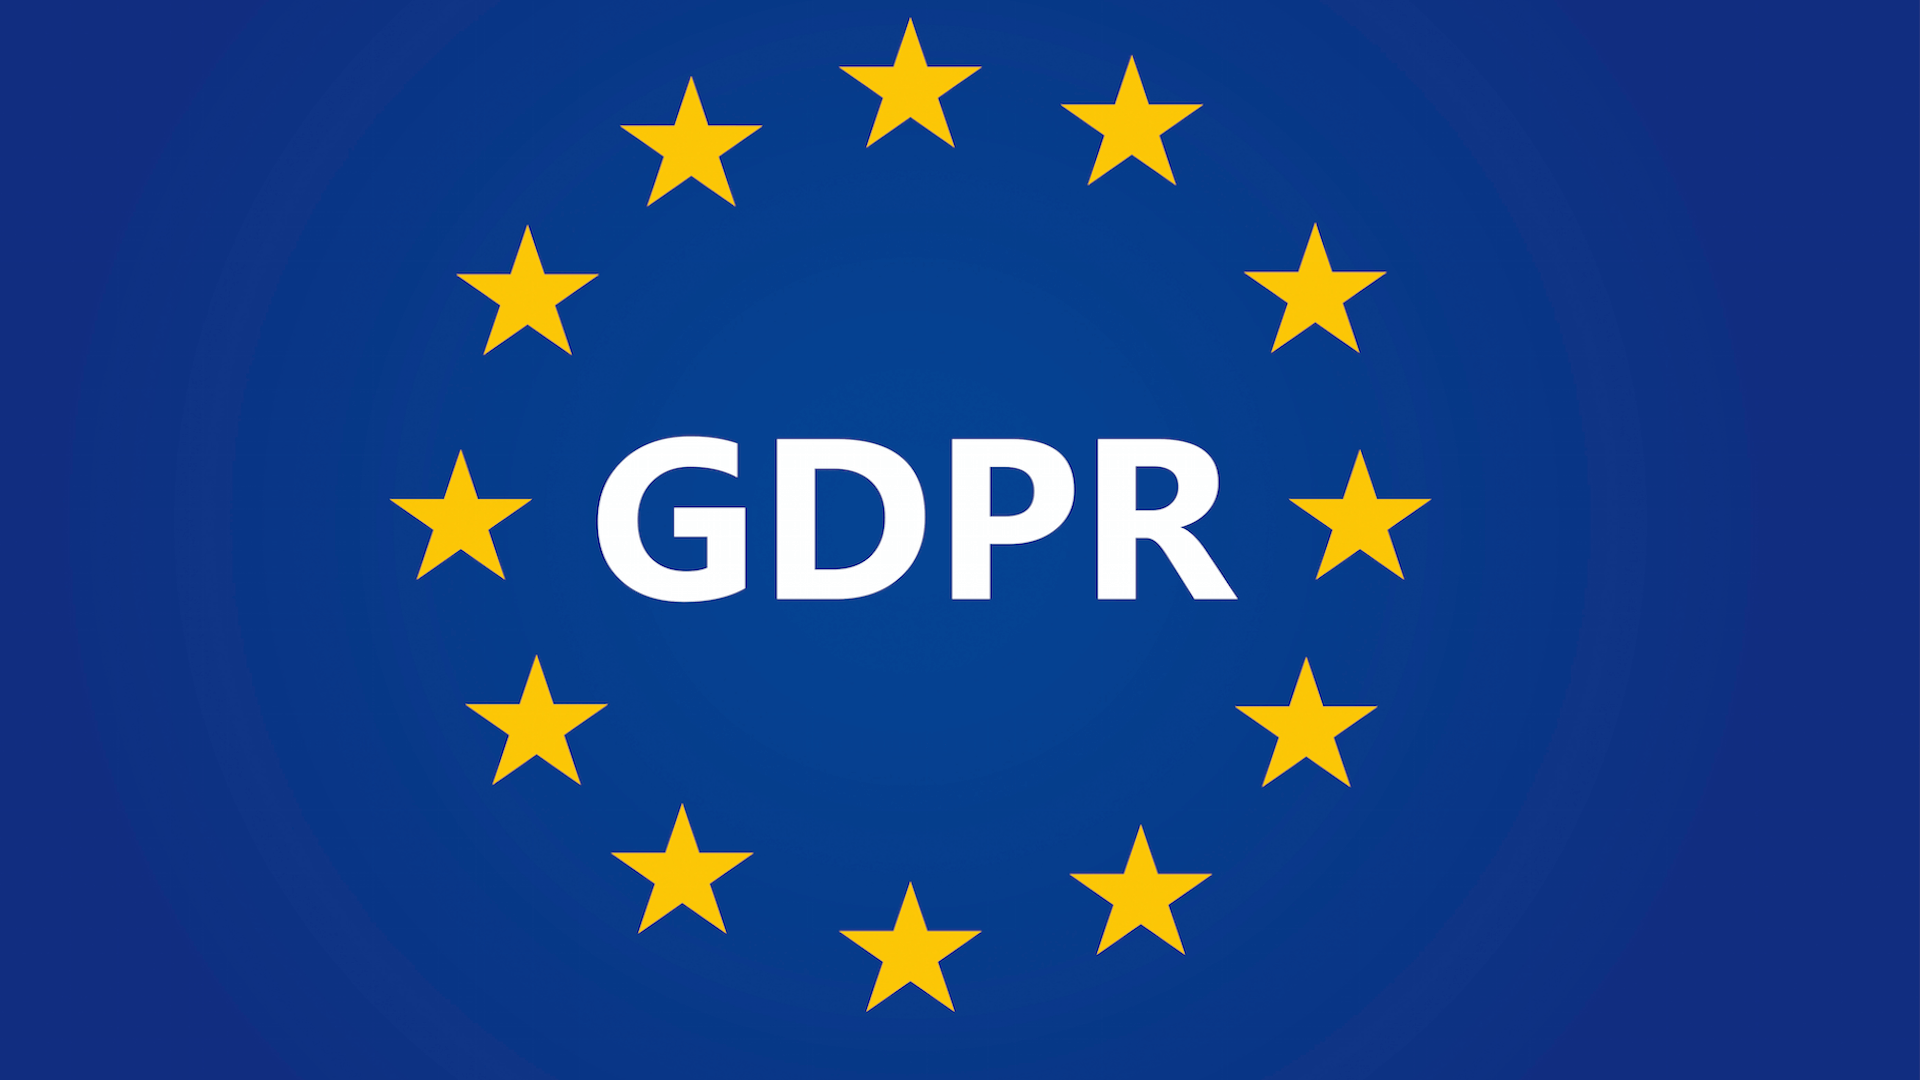 GDPR - GDPR fine of 10 million for employee monitoring